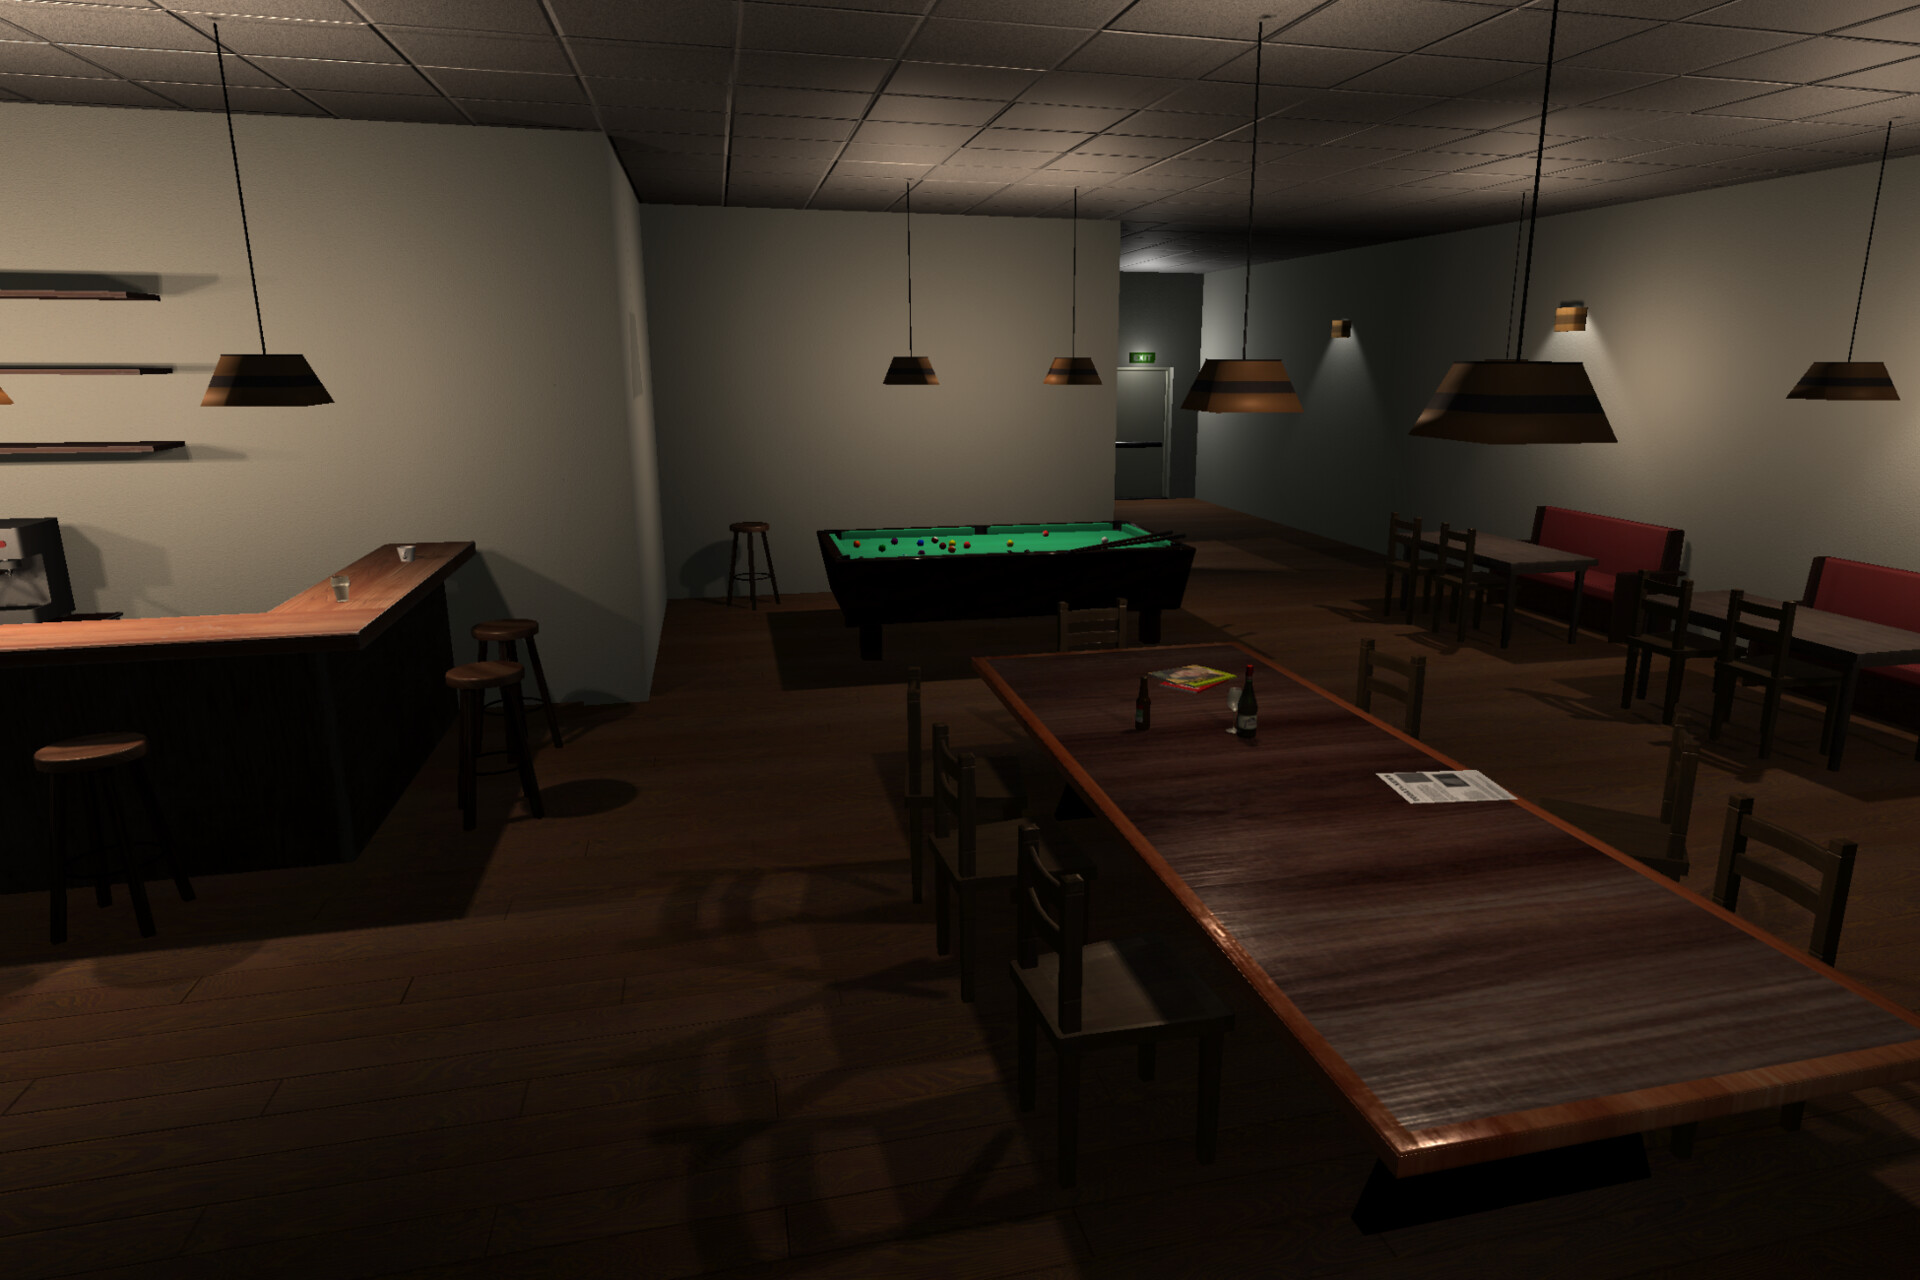 Cozy Cafe / Bar #2 - game asset